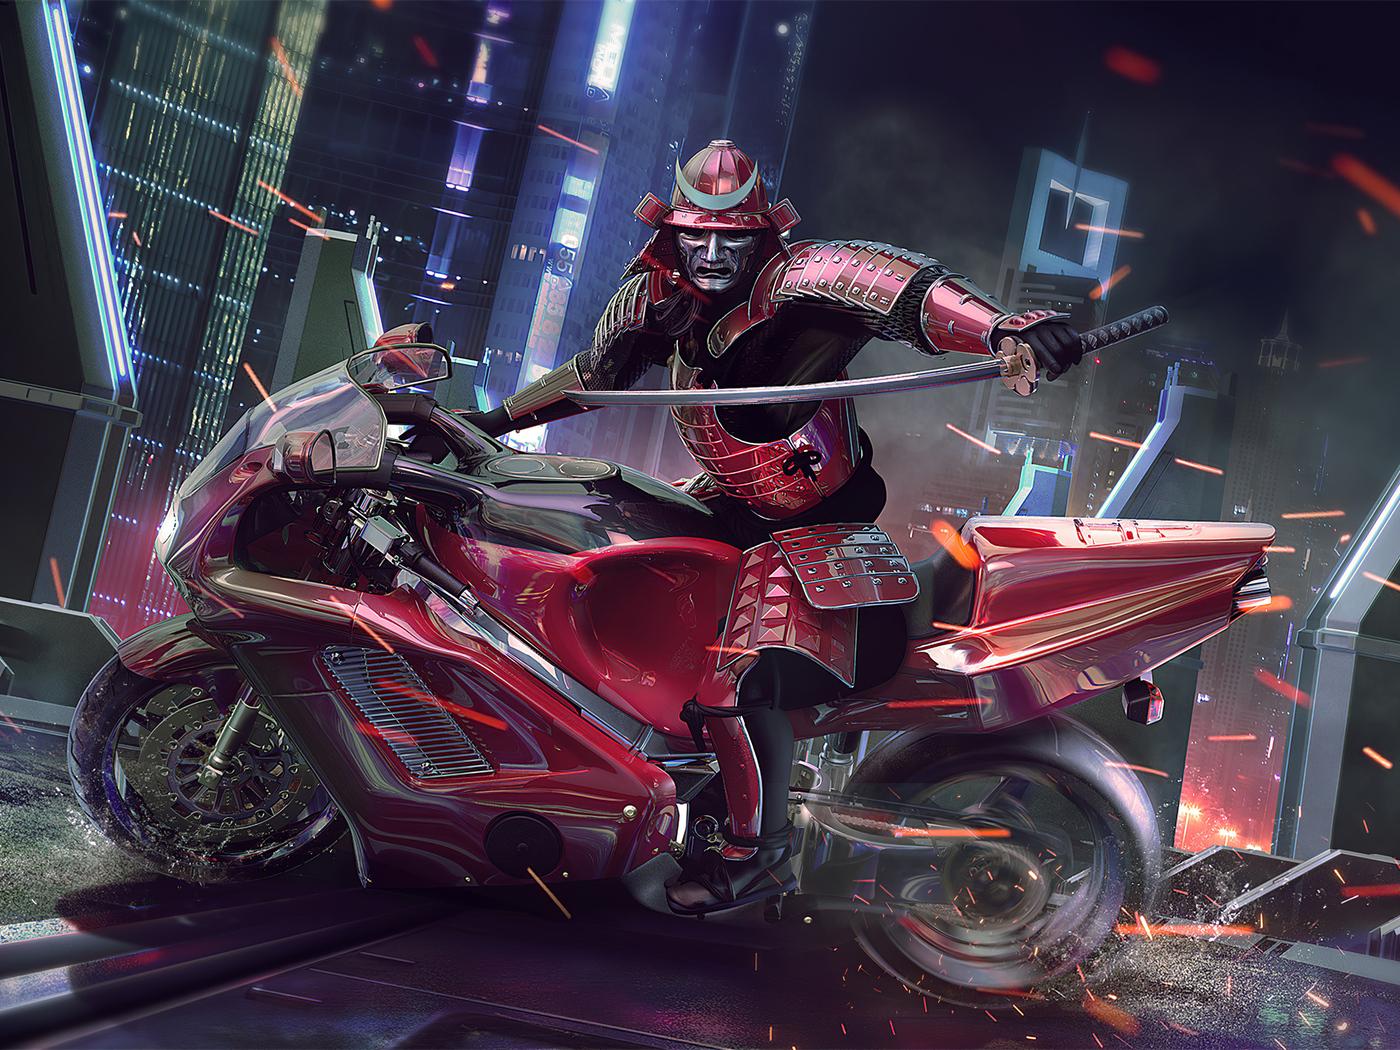 classic-never-die-biker-4k-th.jpg